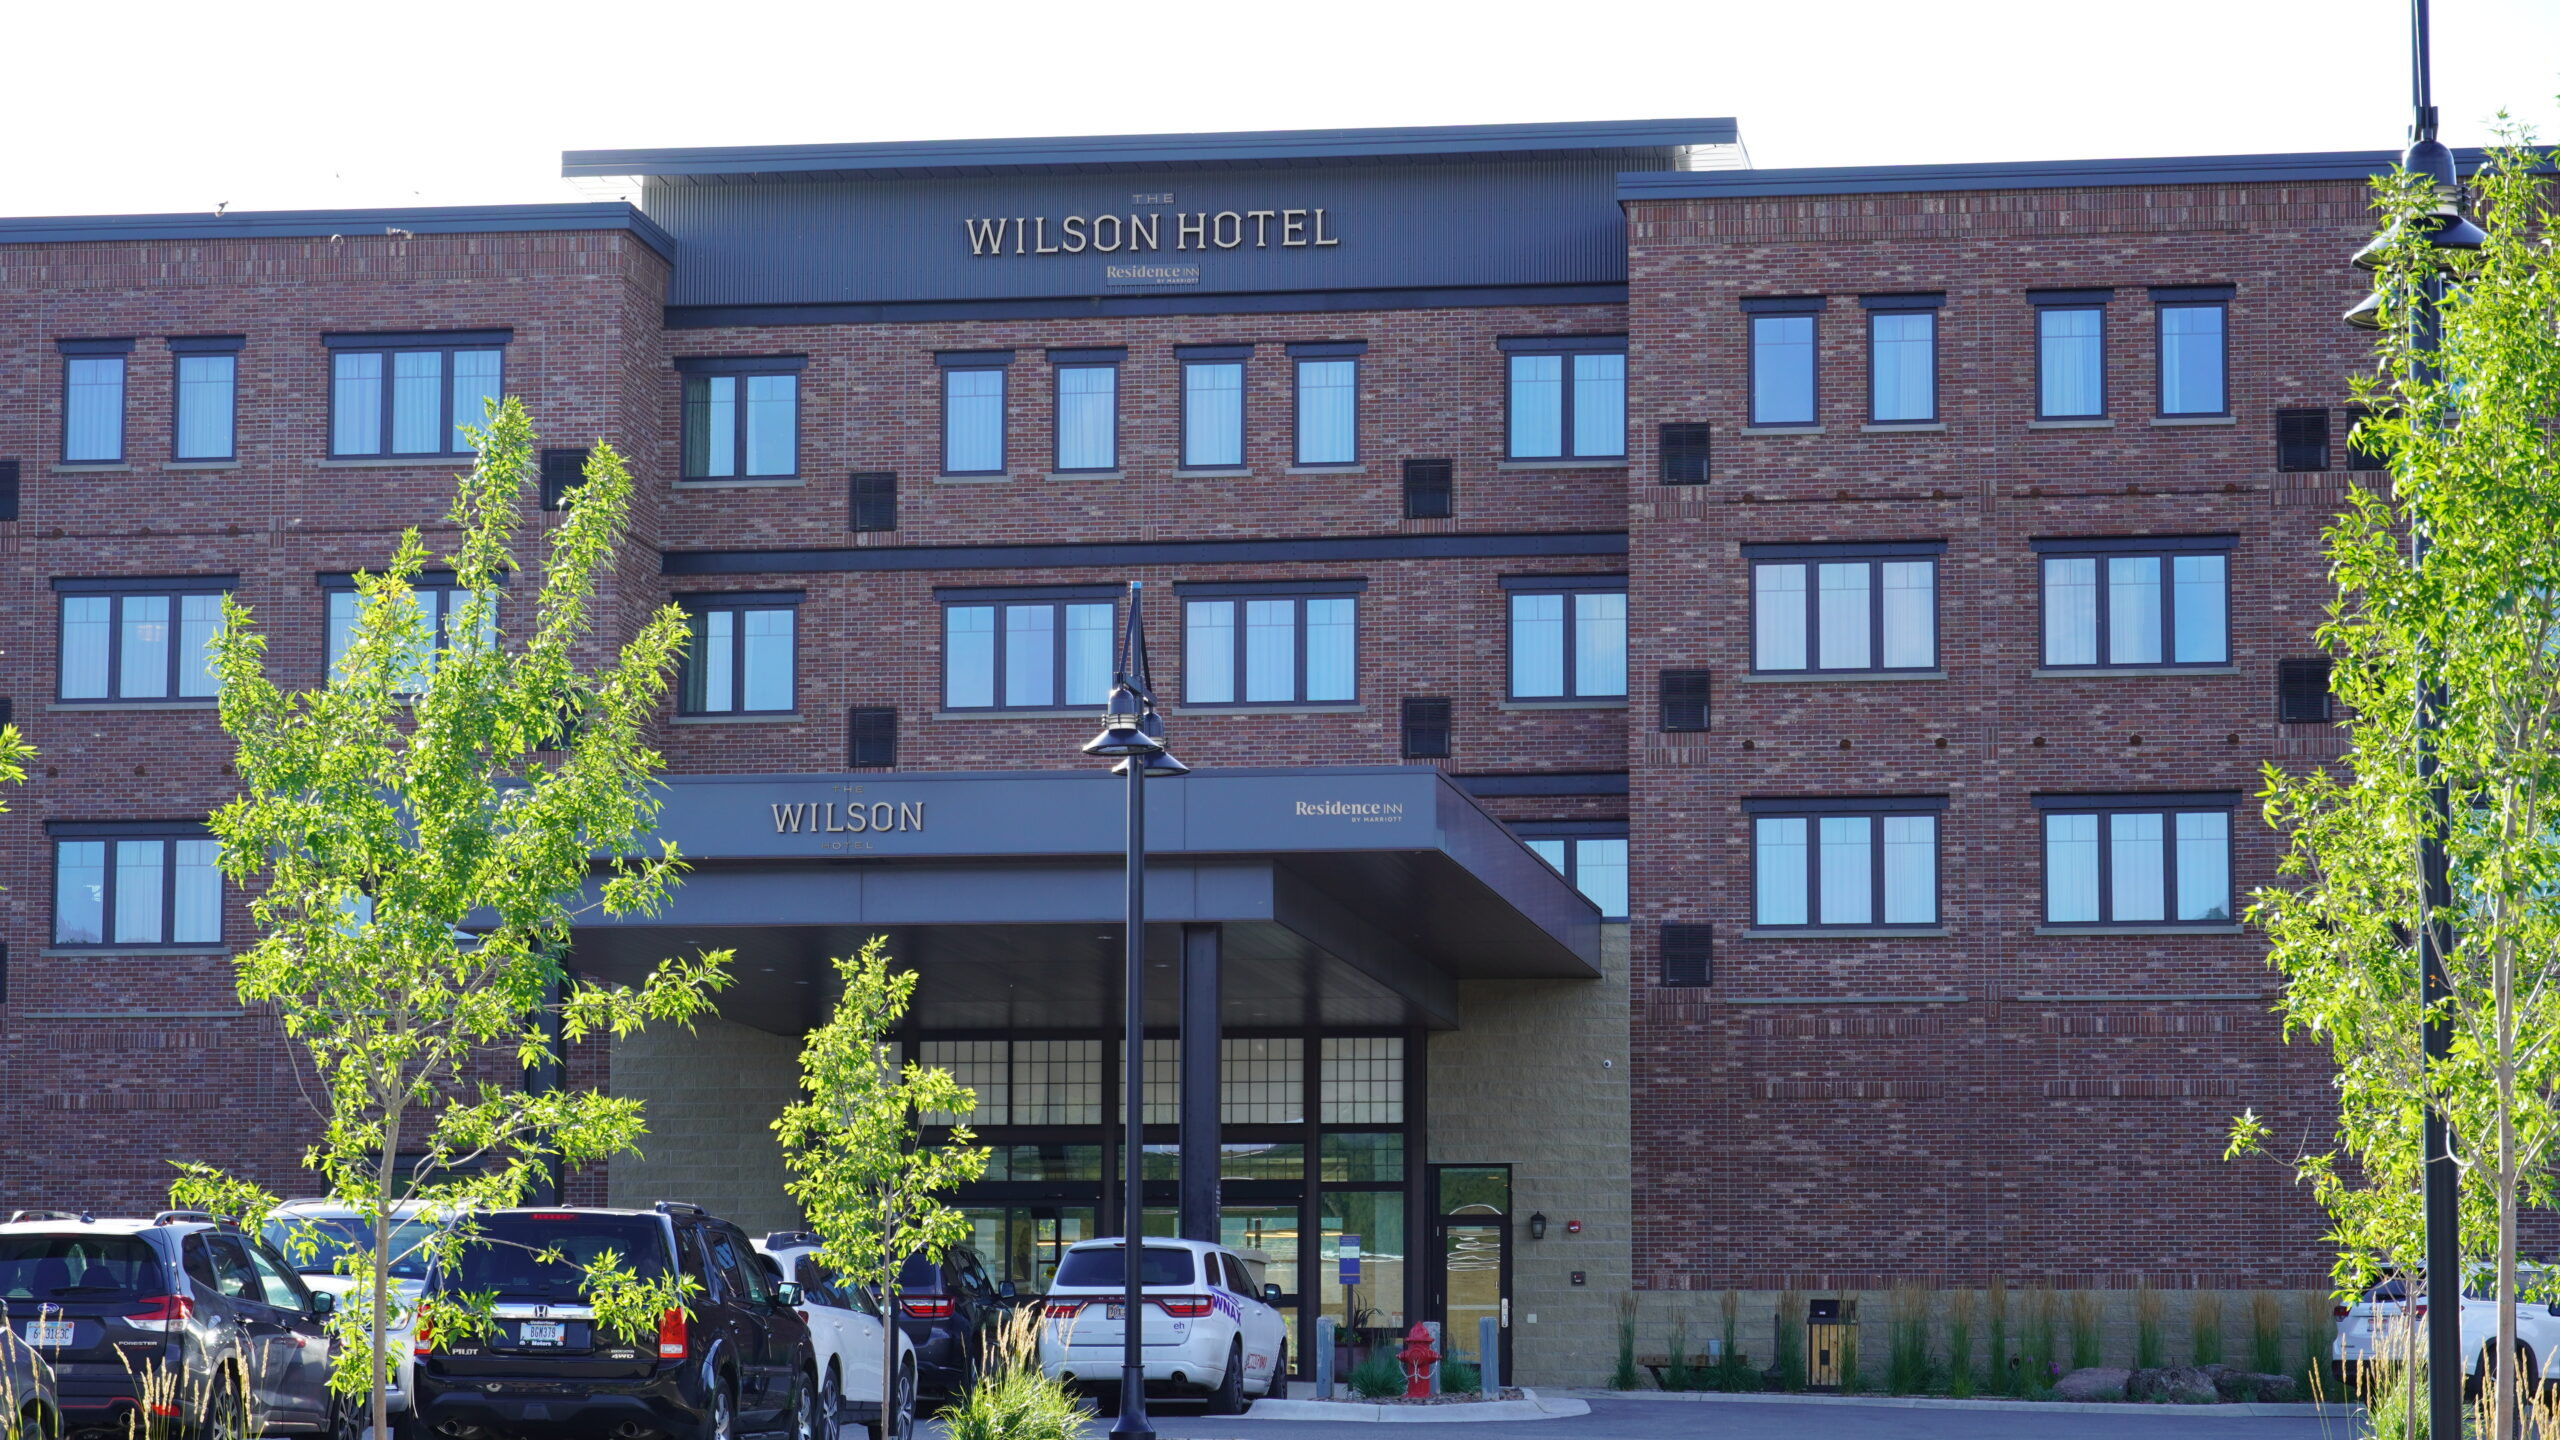 Wilson Hotel Front